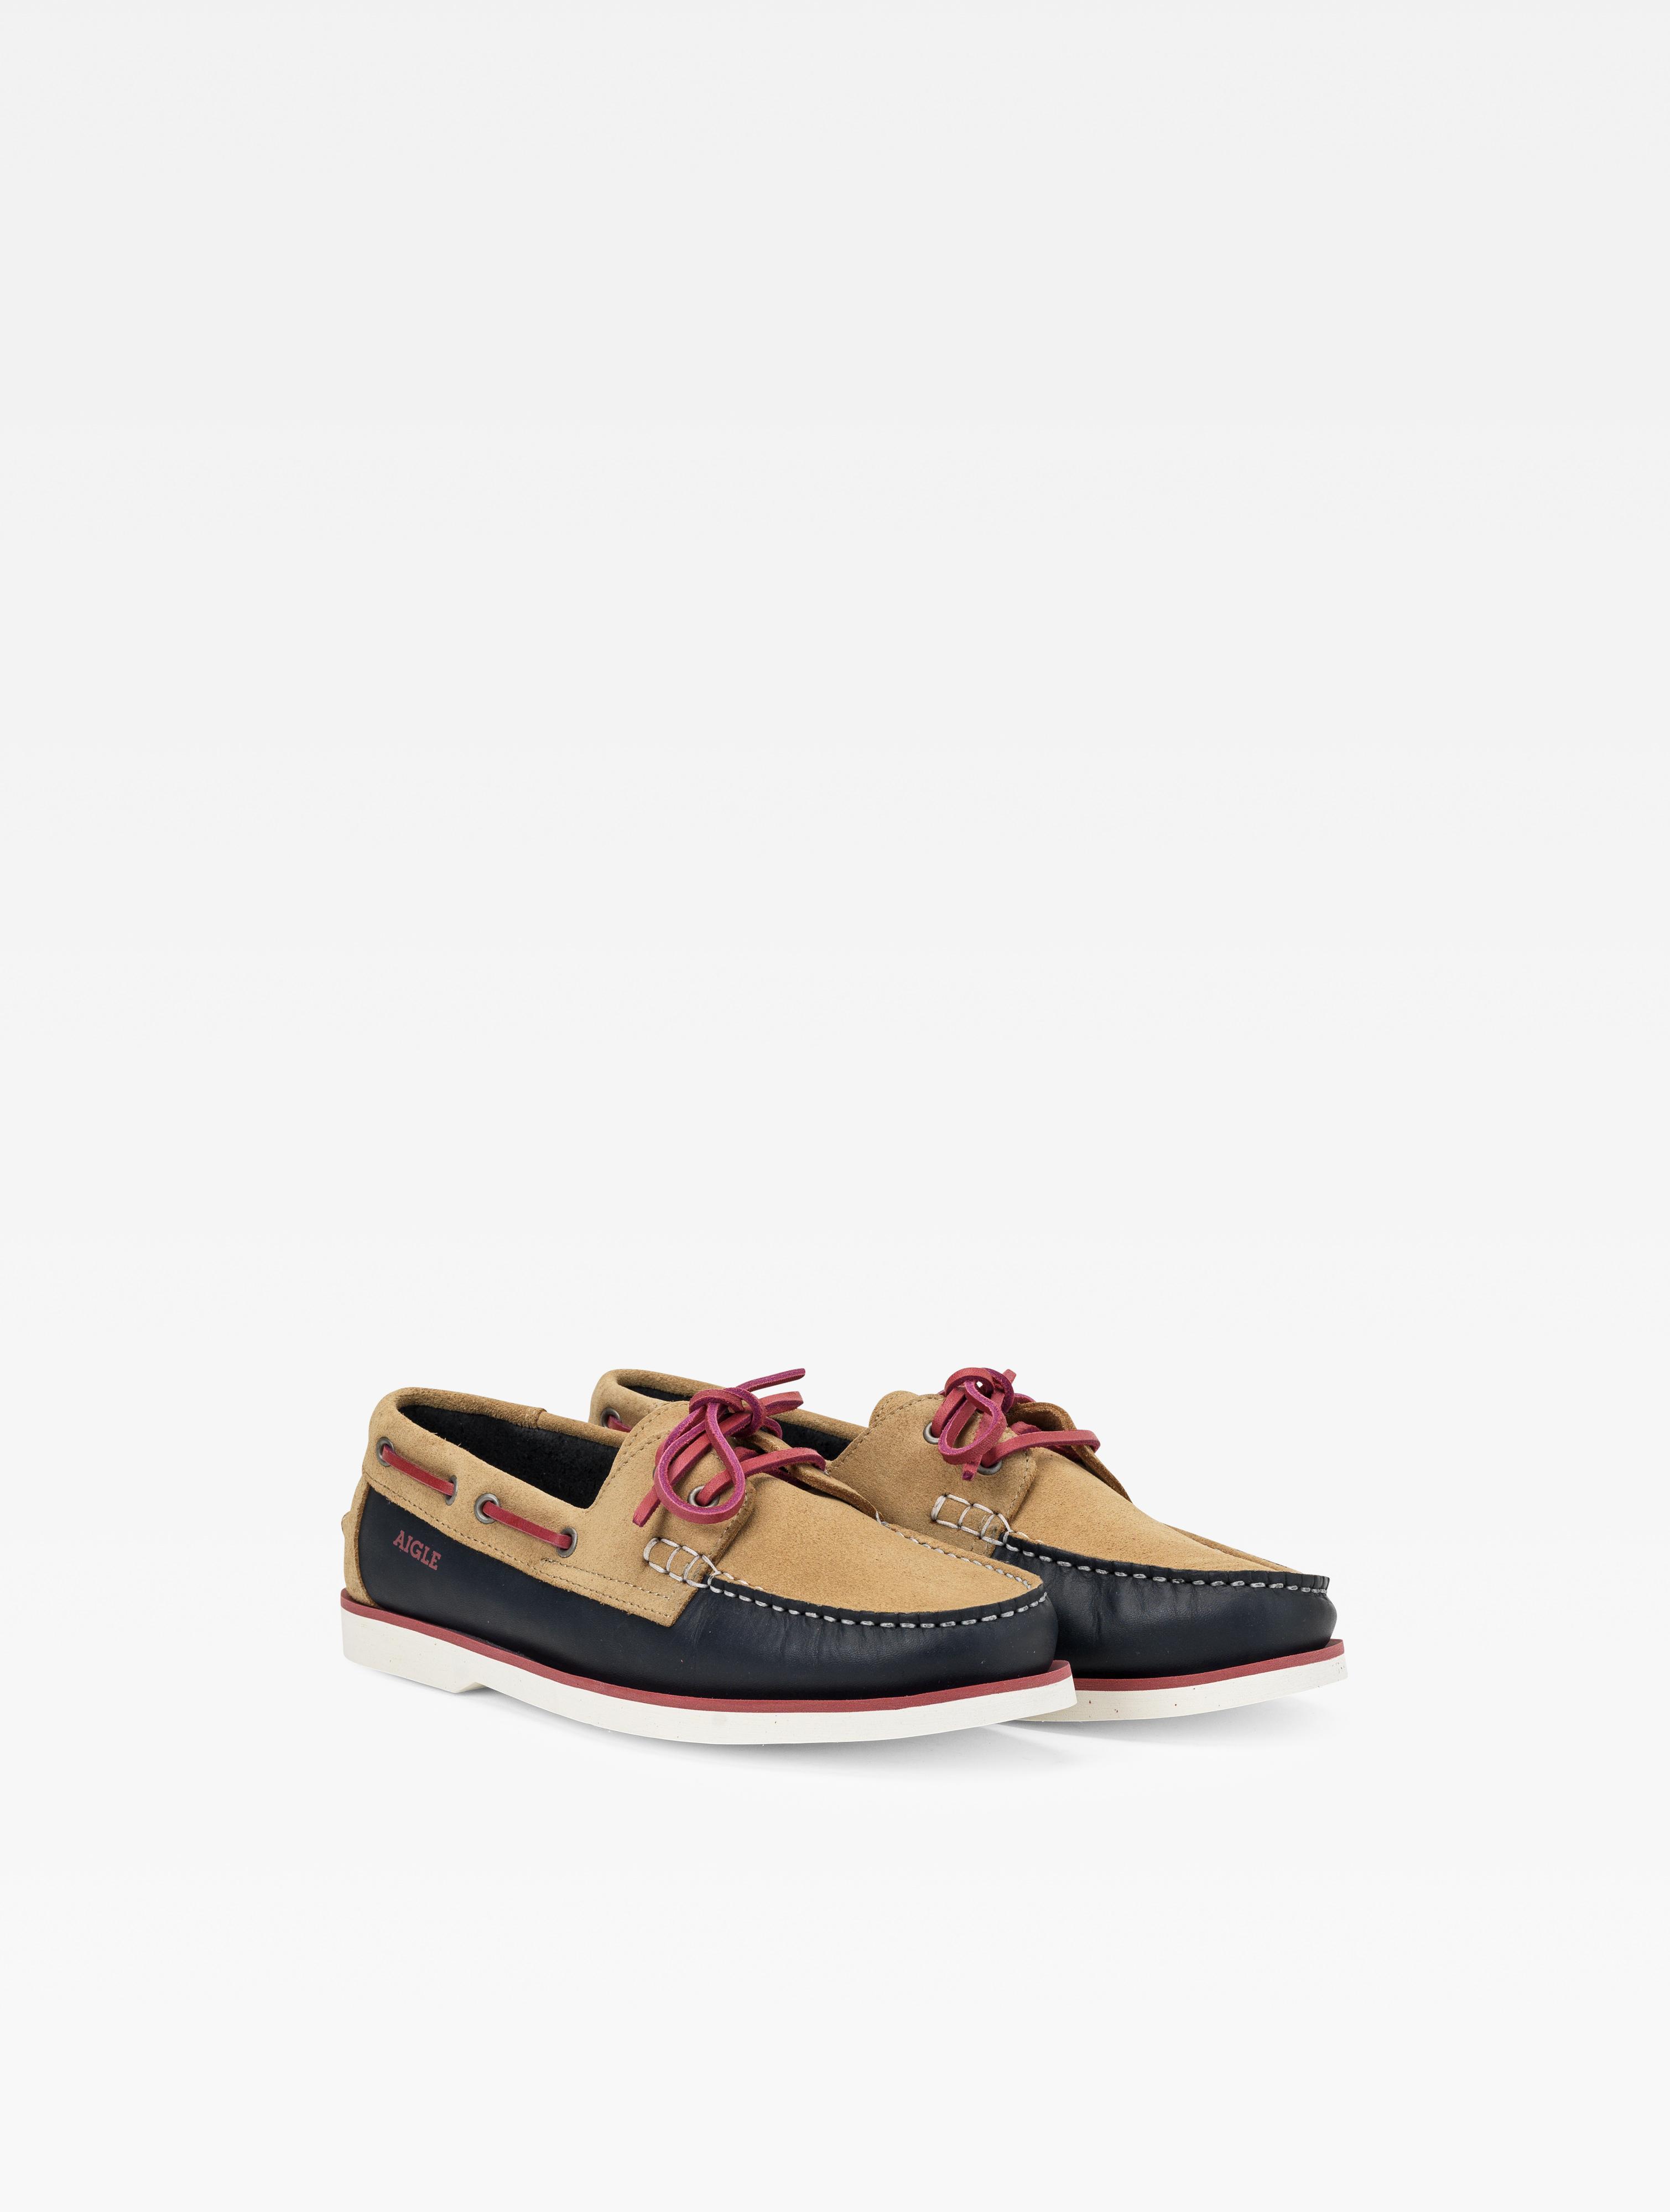 Chaussure bateau en cuir femme - Nubila